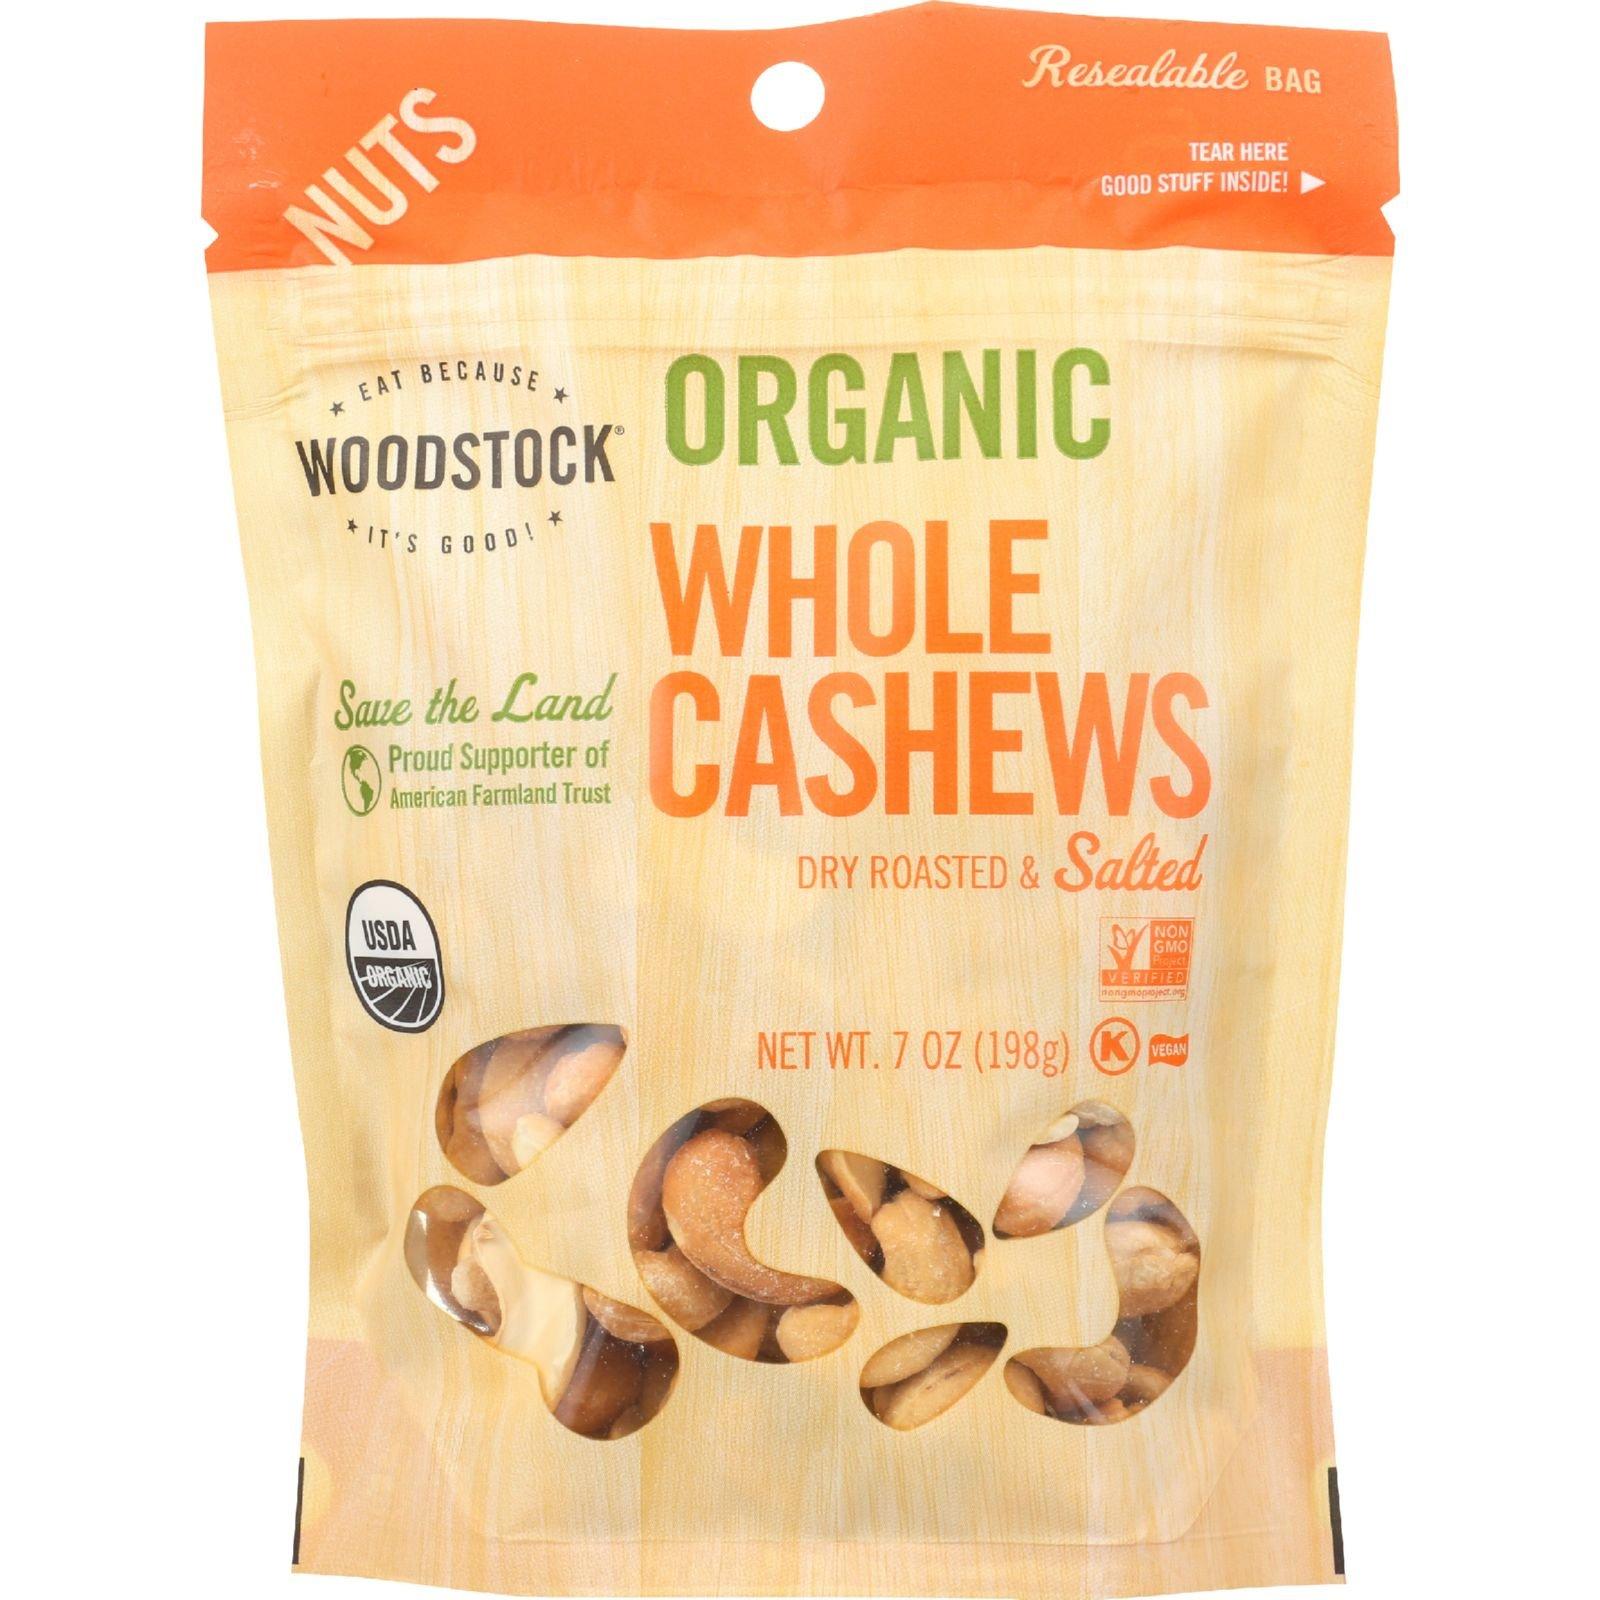 Woodstock Nuts - Organic - Cashews - Whole - Large - Dry Roasted - Salted - 7 oz - case of 8